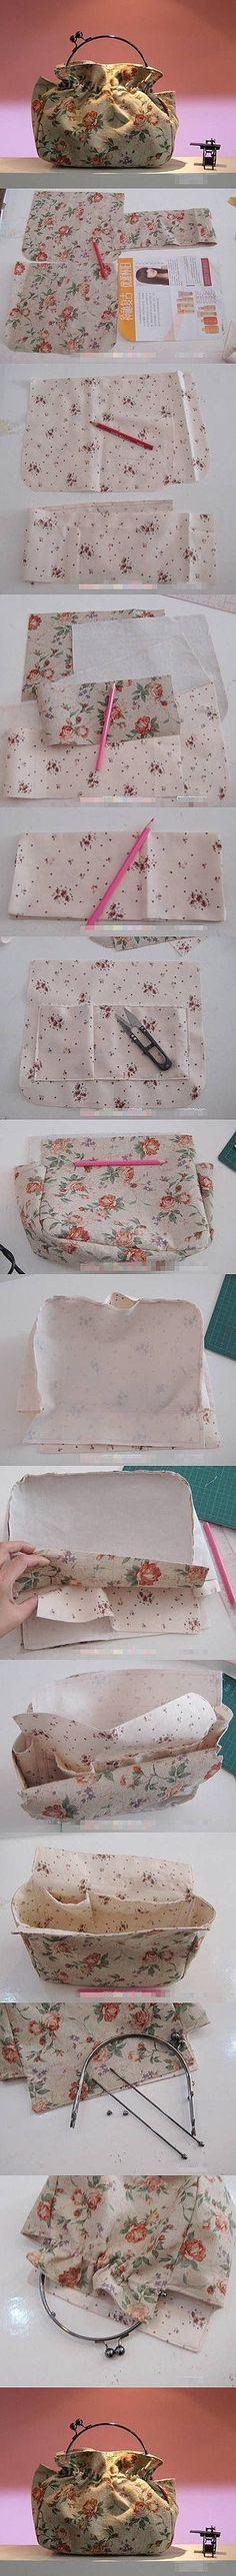 DIY Handbag diy craft crafts craft ideas easy crafts diy ideas diy crafts fashion crafts craft handbag diy purse